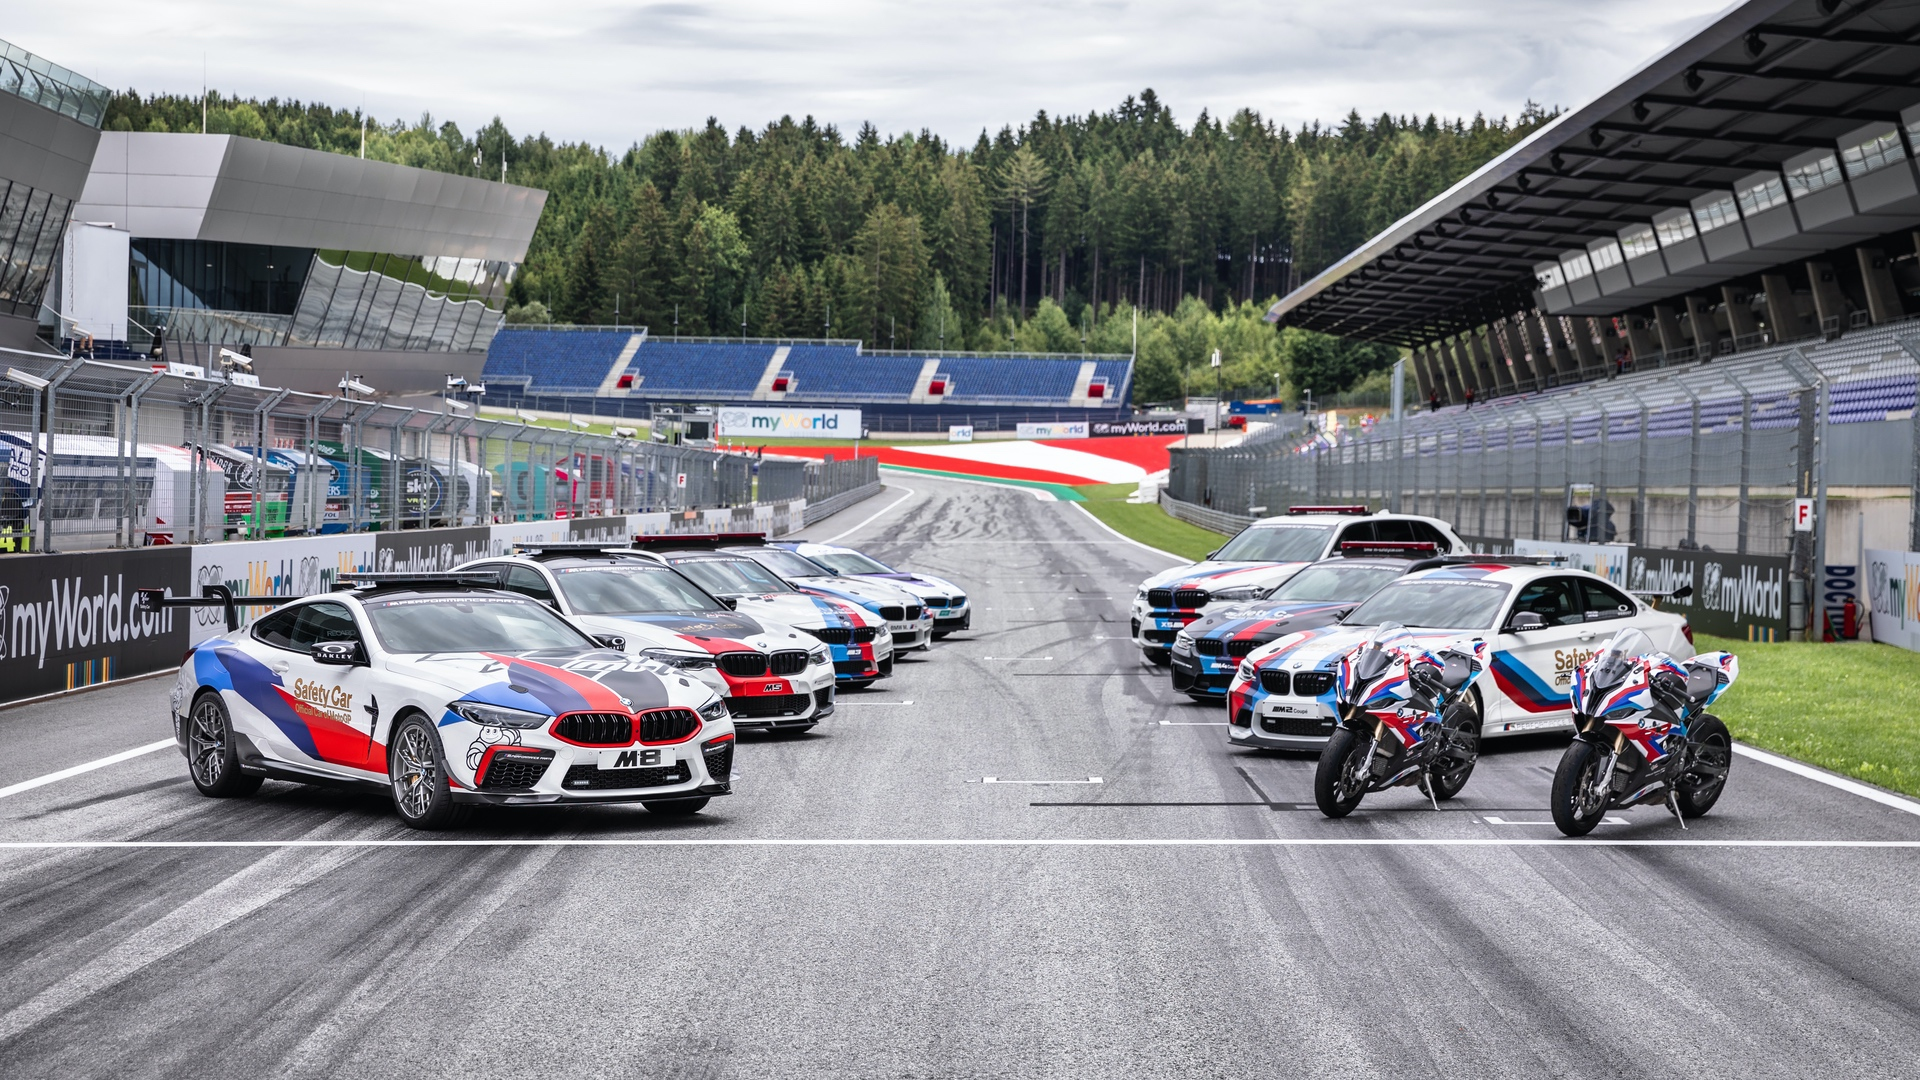 BMW_M8_MotoGP_Safety_Car_0028